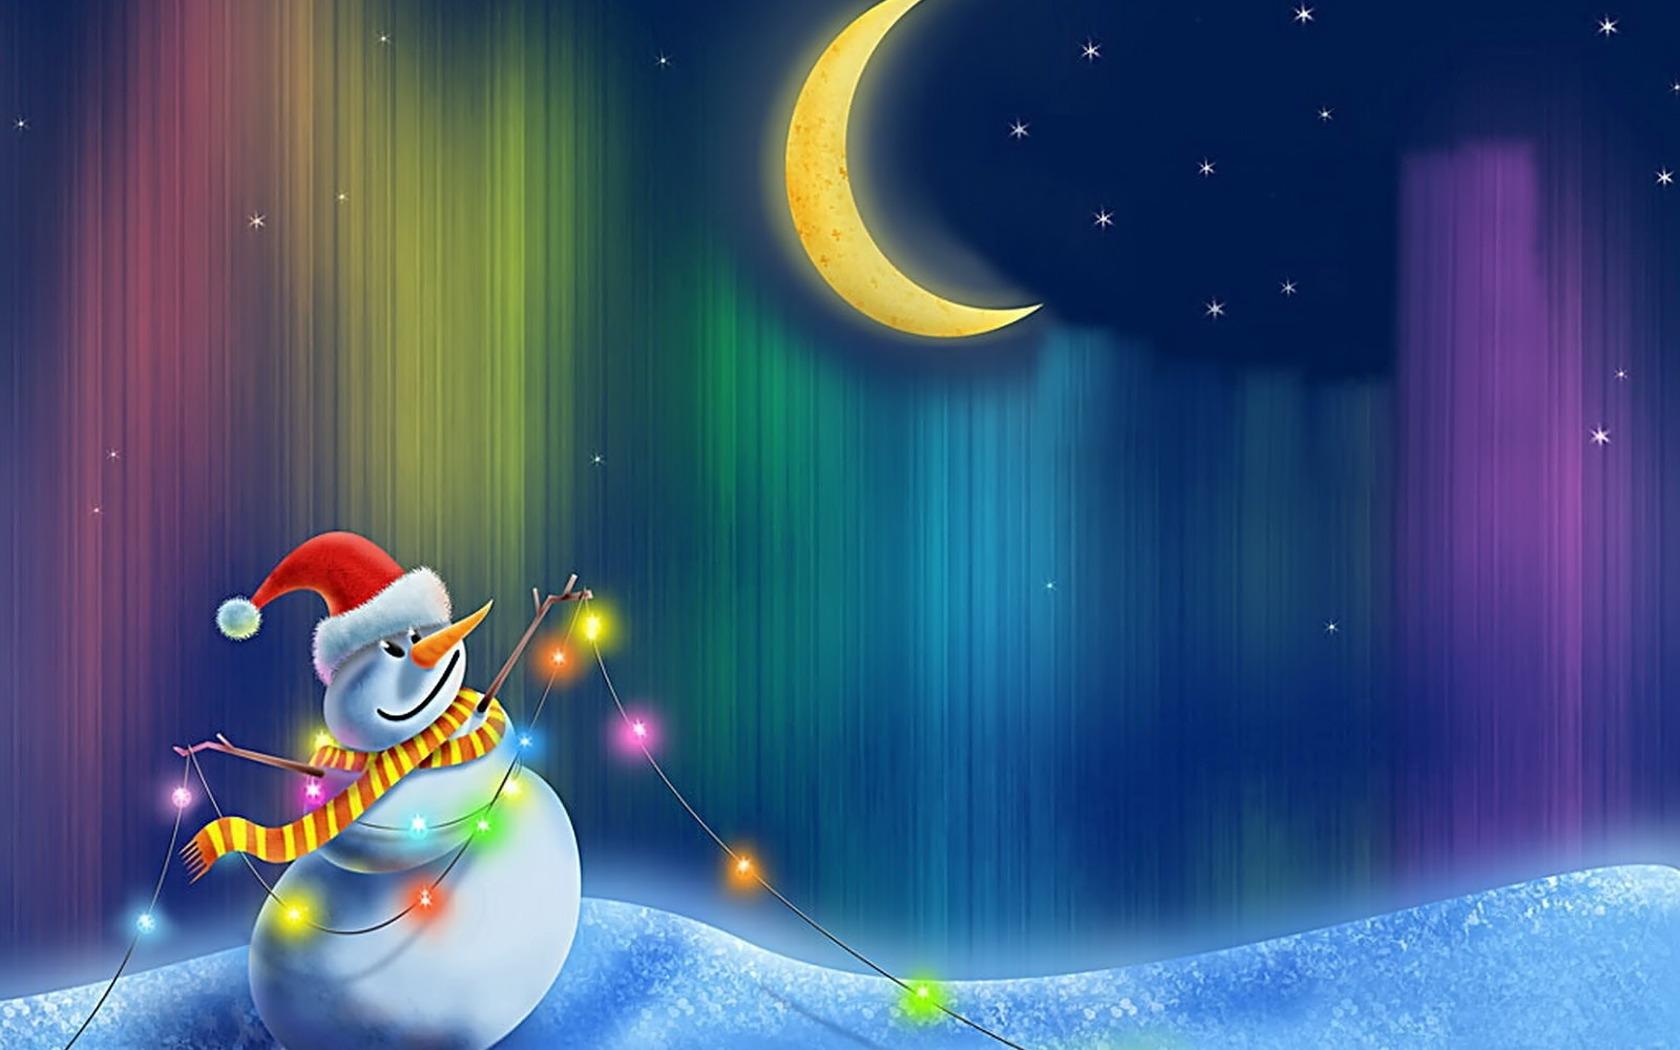 animated christmas wallpapers for desktop 1680x1050